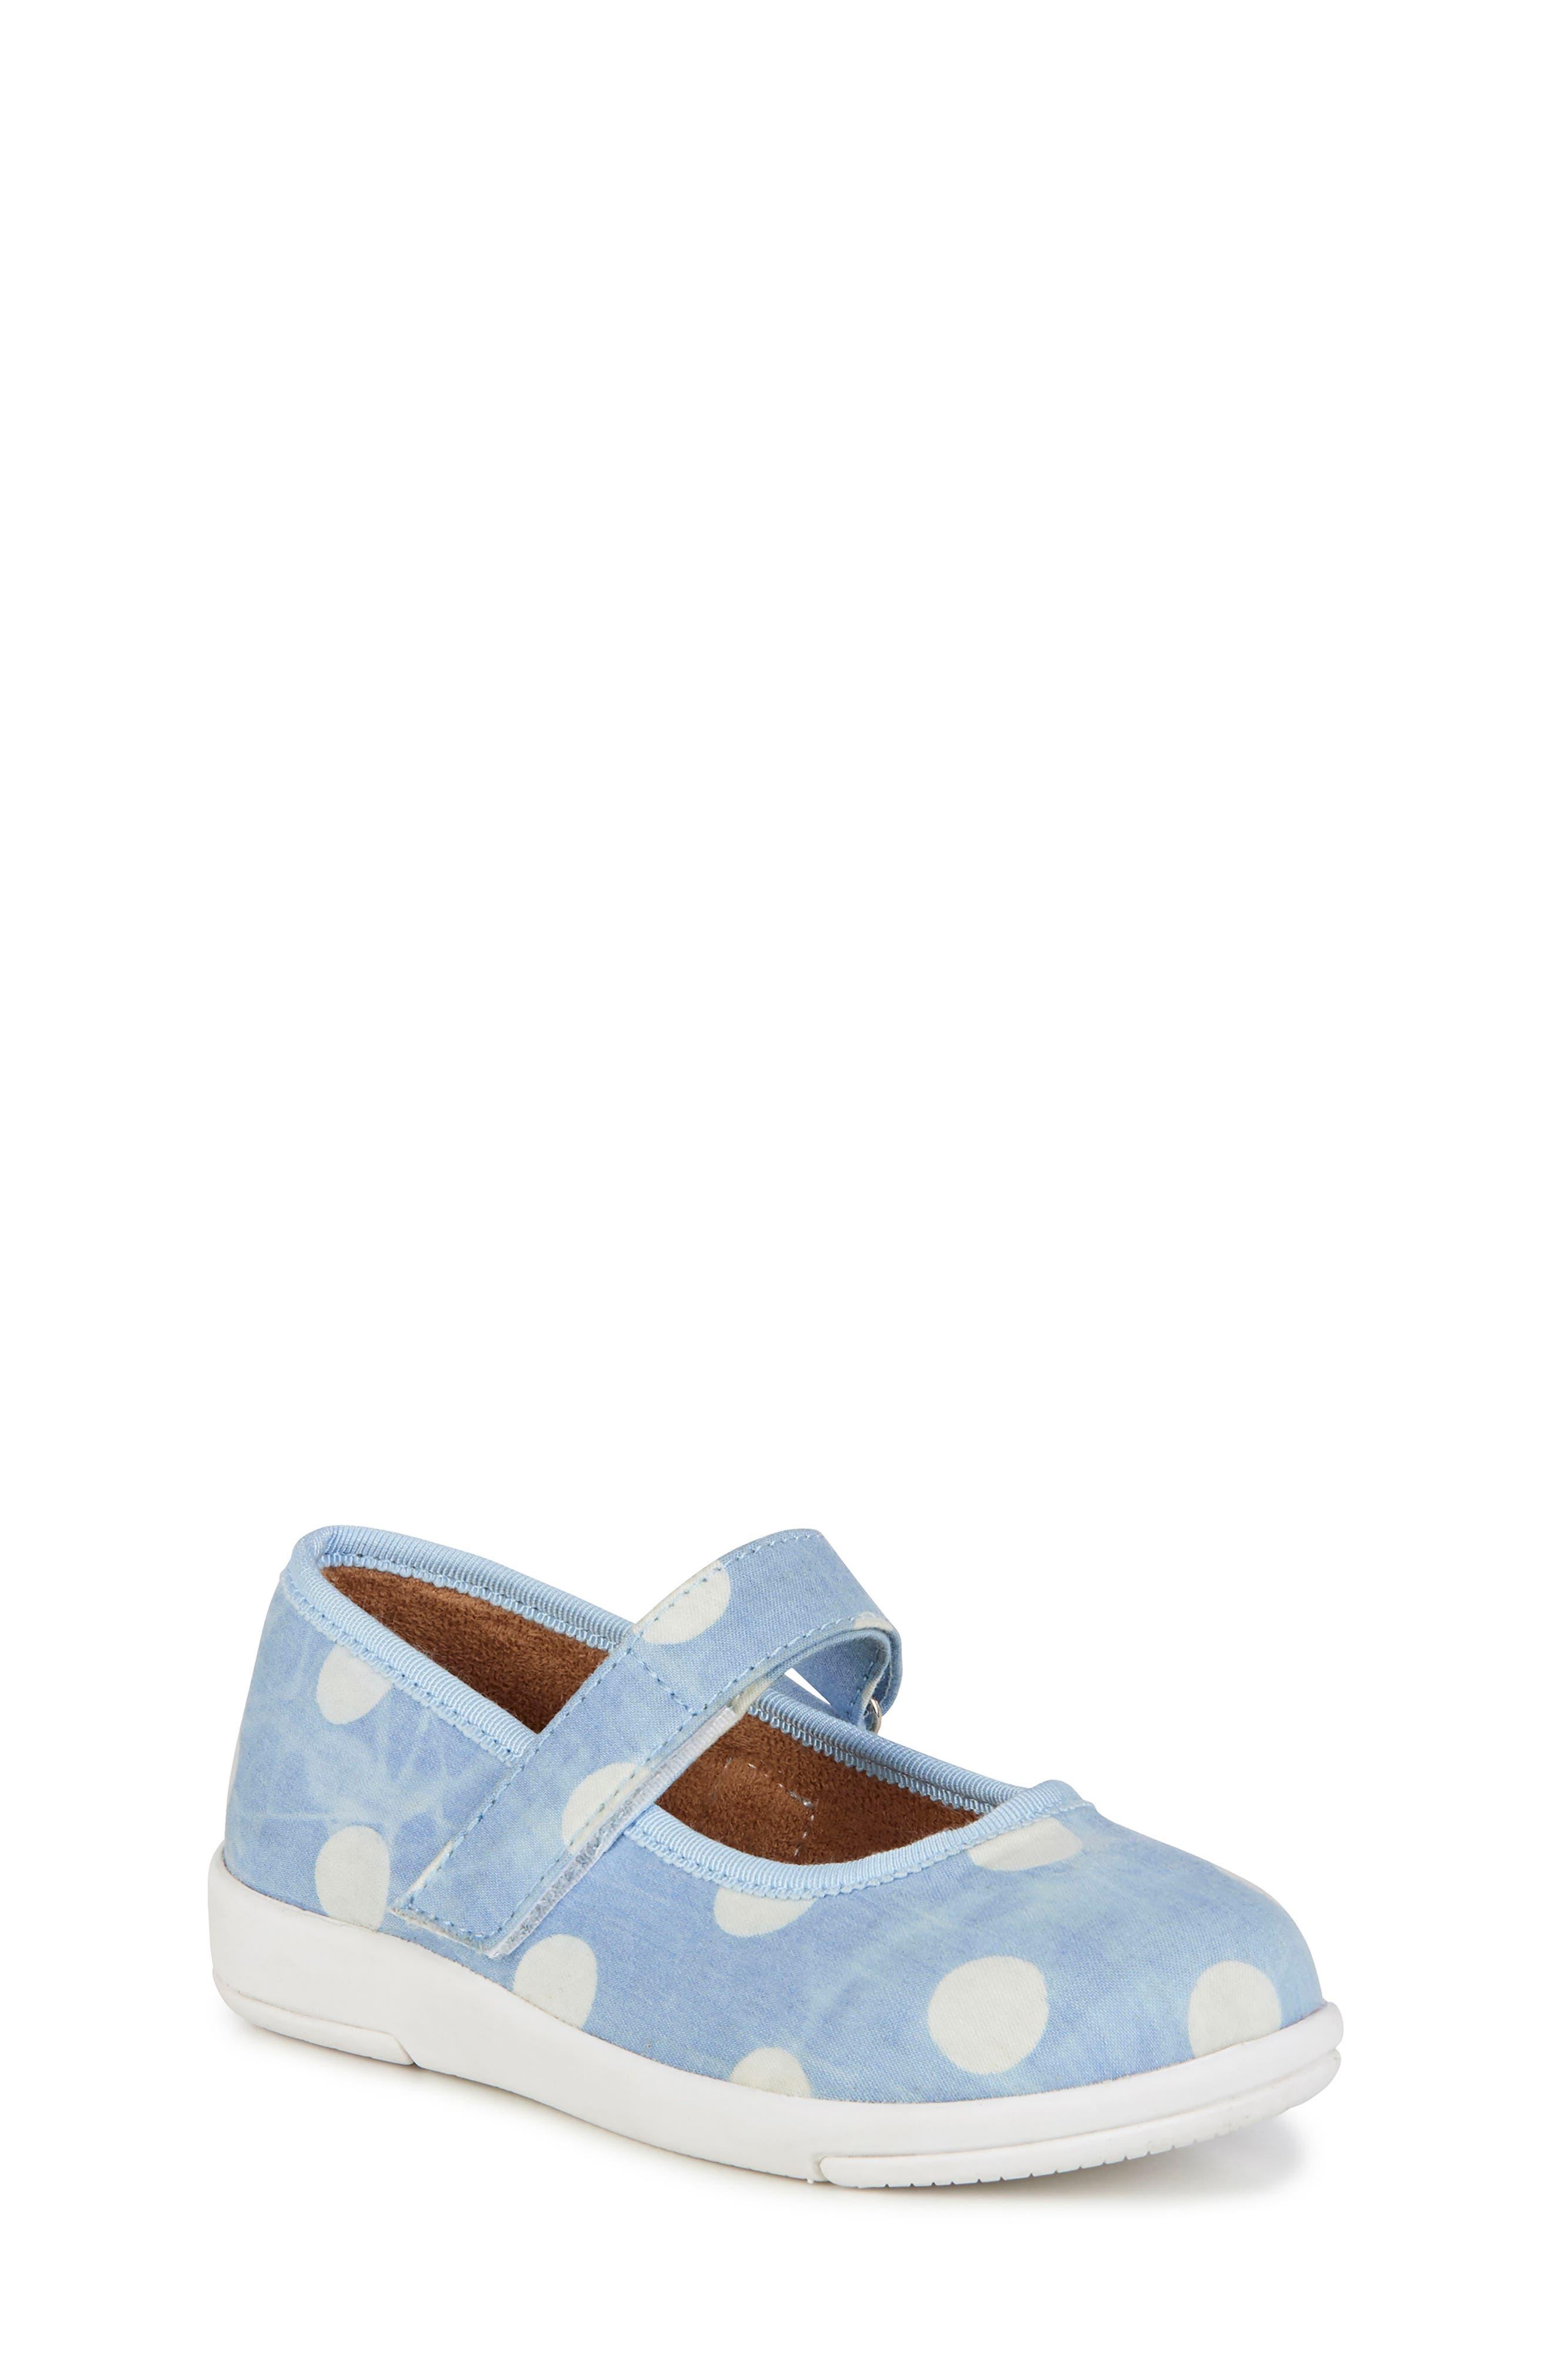 Deena Mary Jane Sneaker,                             Main thumbnail 1, color,                             SPOT LIGHT DENIM DISTRESS